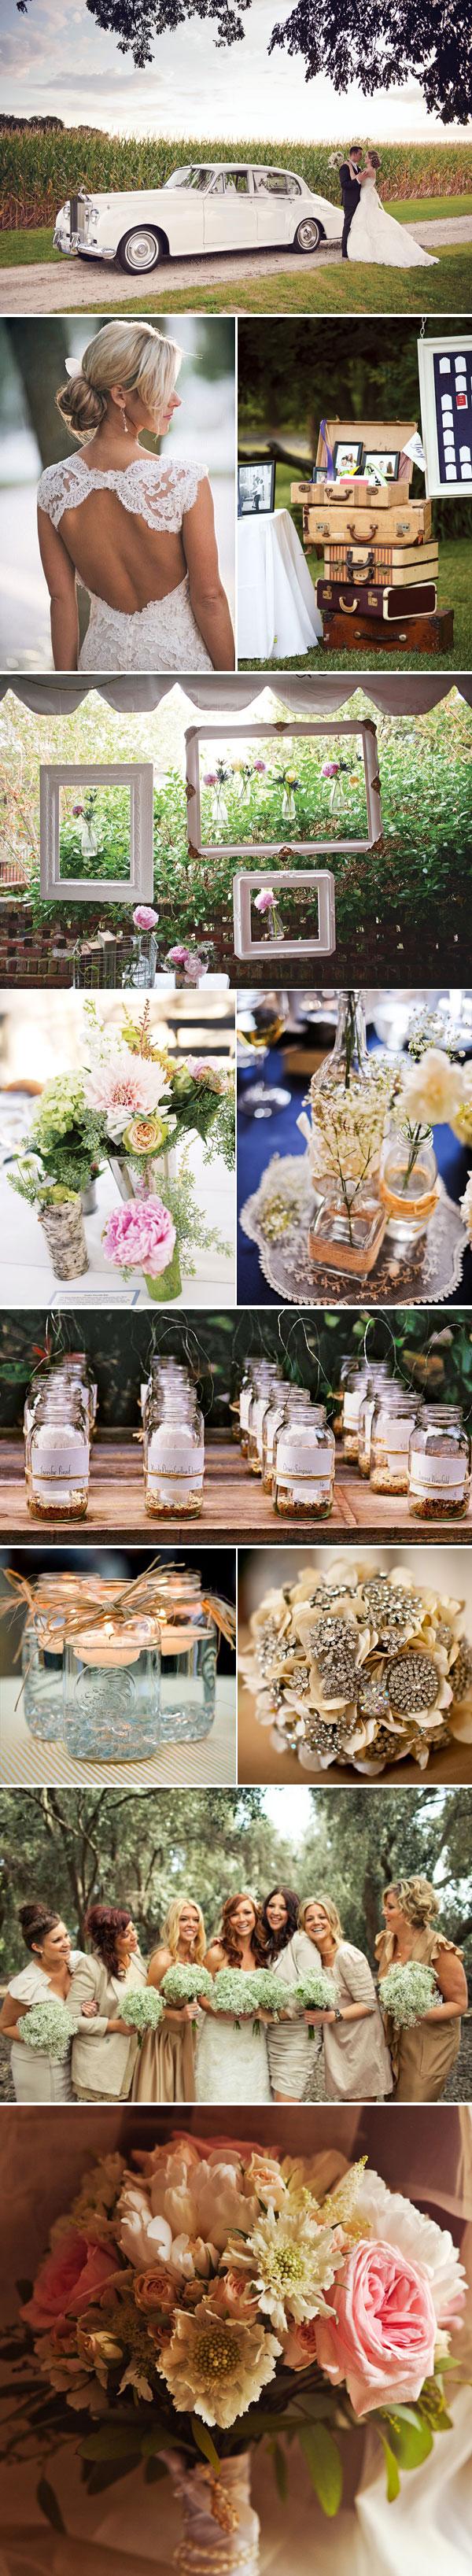 vinntage-wedding-style (1)